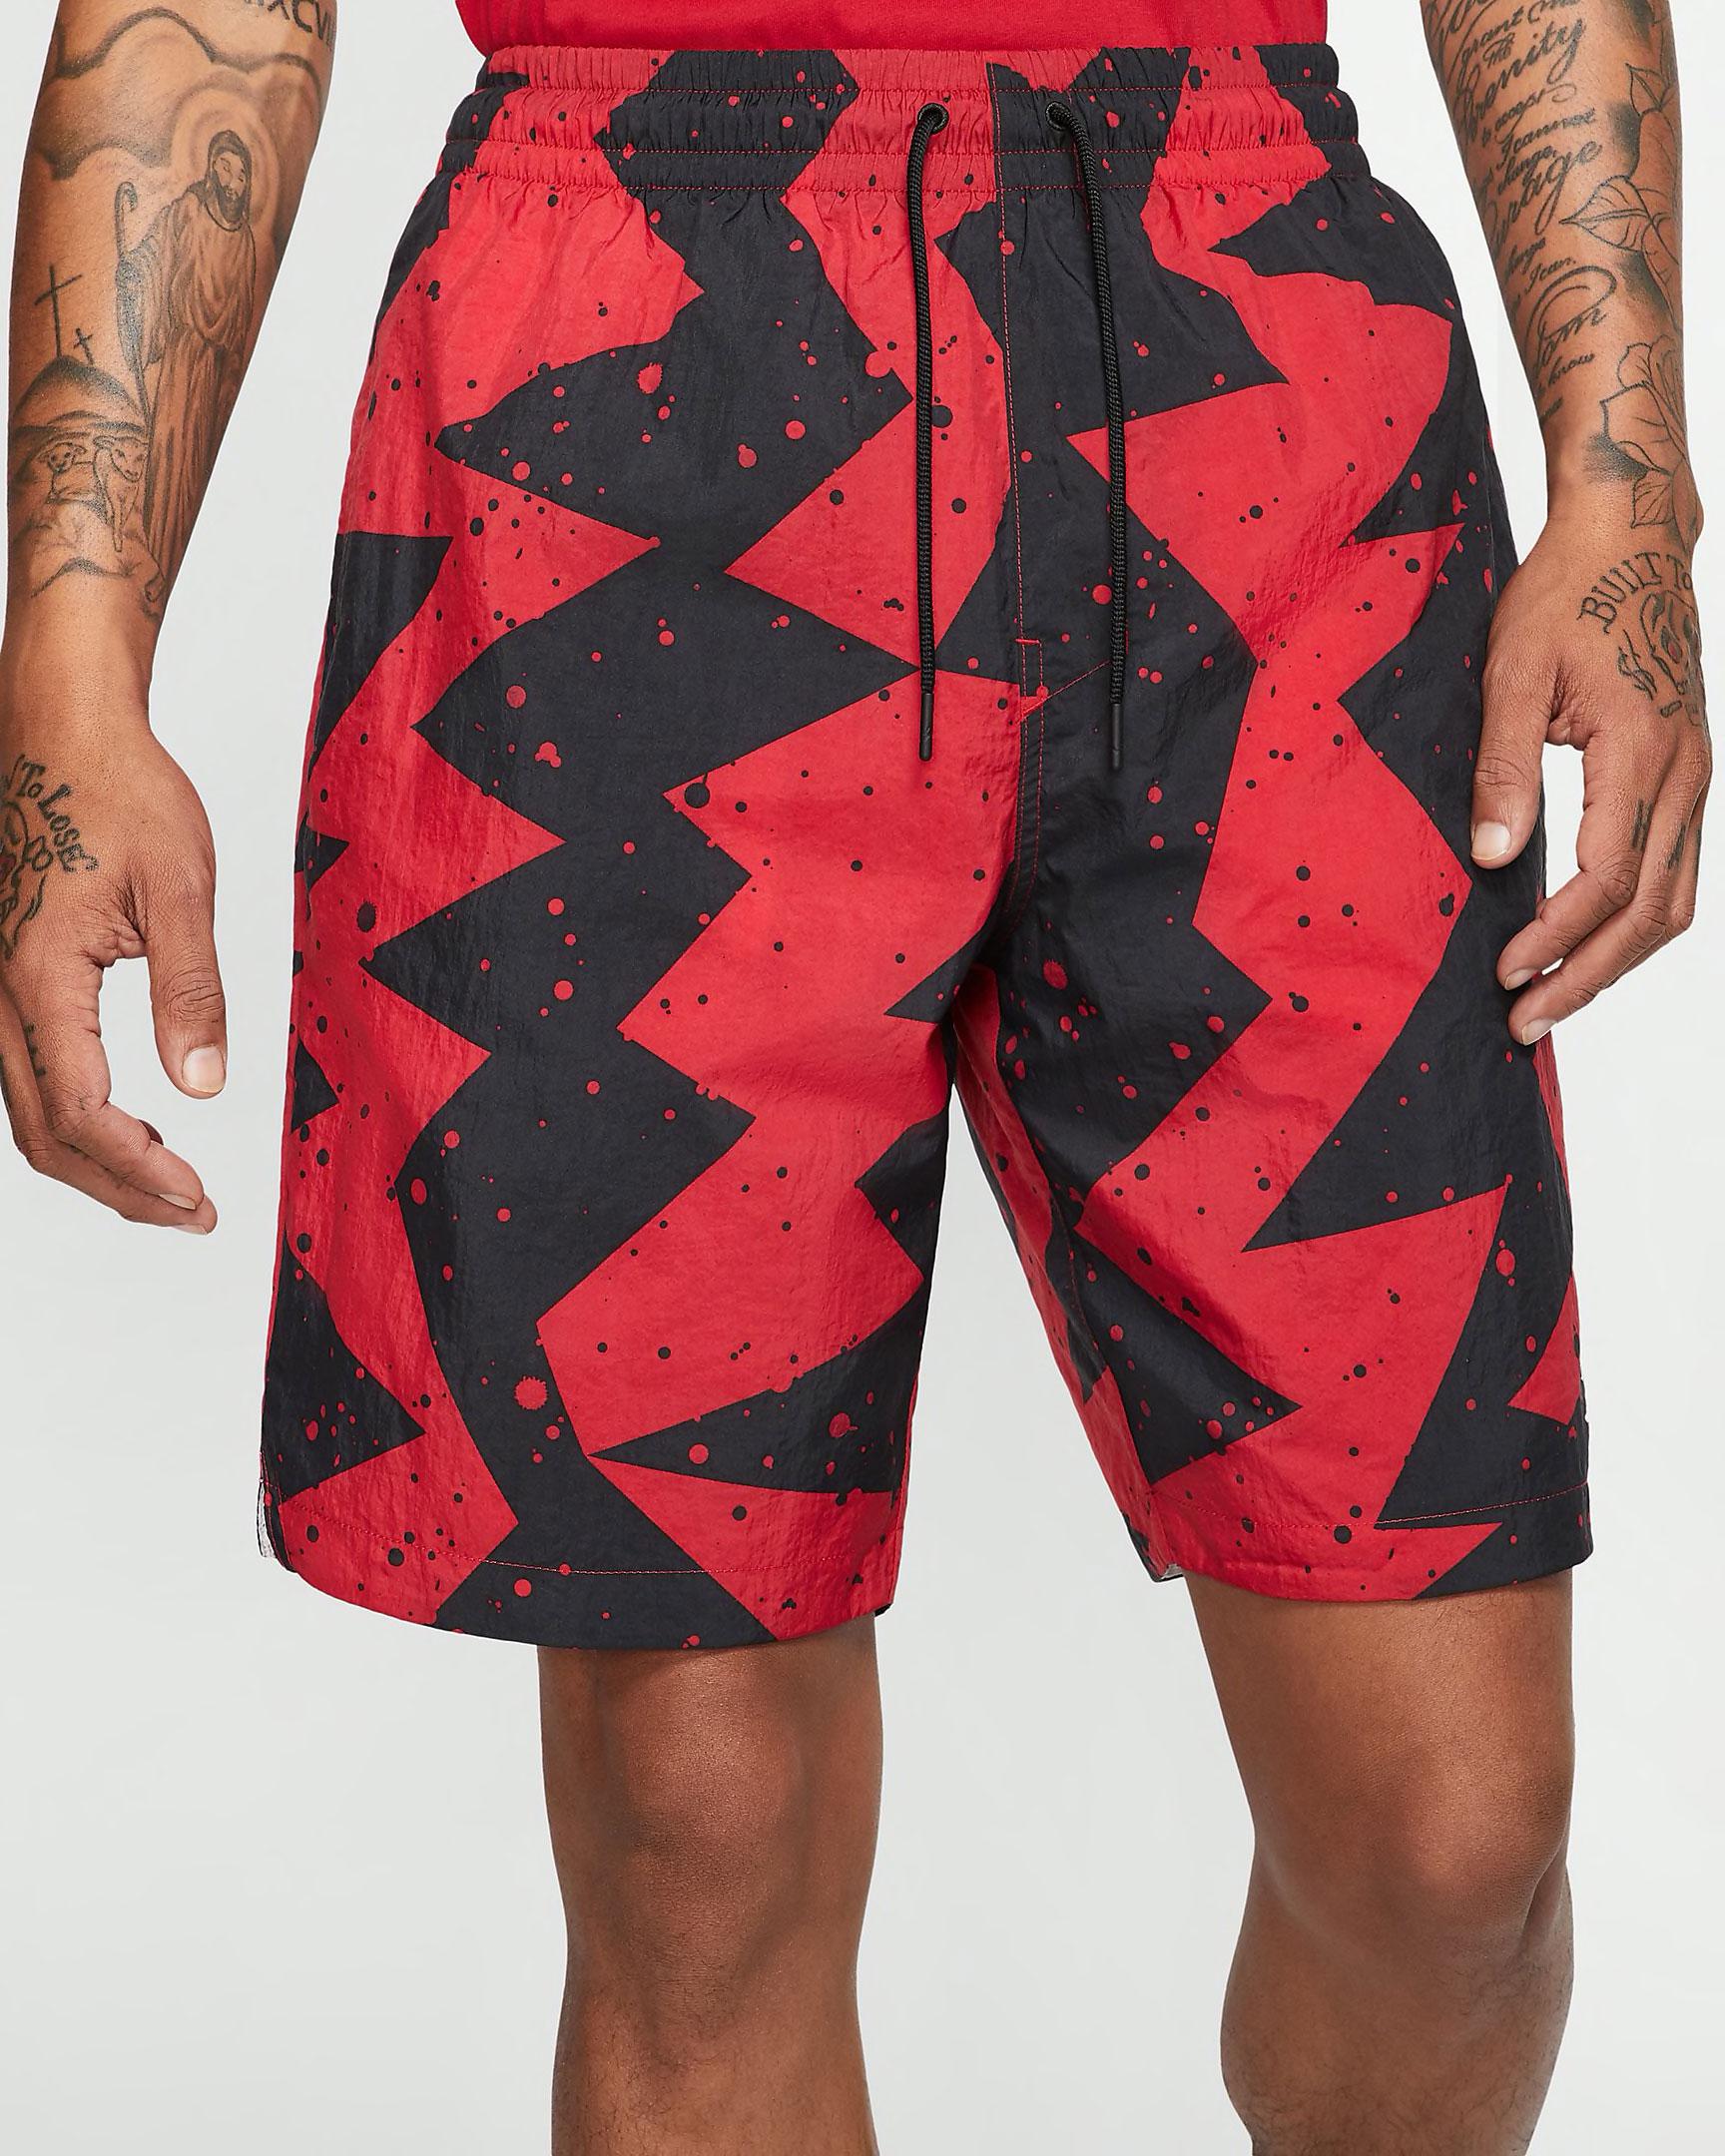 jordan-poolside-shorts-red-black-1